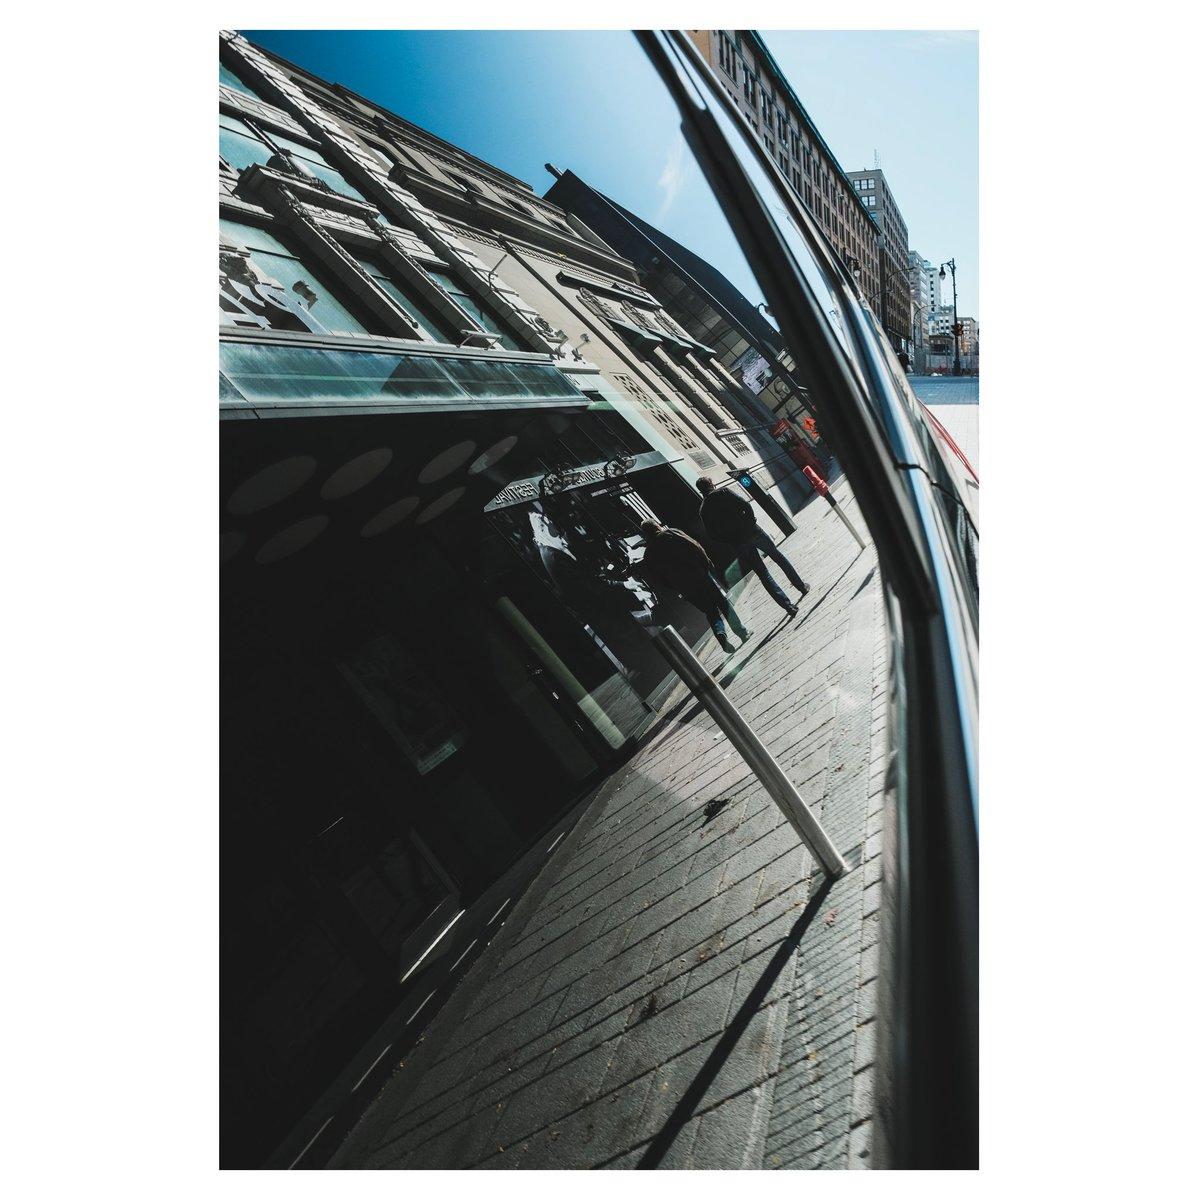 [ Side view ] . . . . #reframedmag #classicchrome #espritmag #photocinematica #25bluehours #somewheremagazine #imaginarymagnitude #cinebible #fujiframez #weltraumzine #la_minimal #n8zine #takemagazine #WTNS #ithosmag #35mm #lekkerzine #dreamermagazine #portbox #broadmag